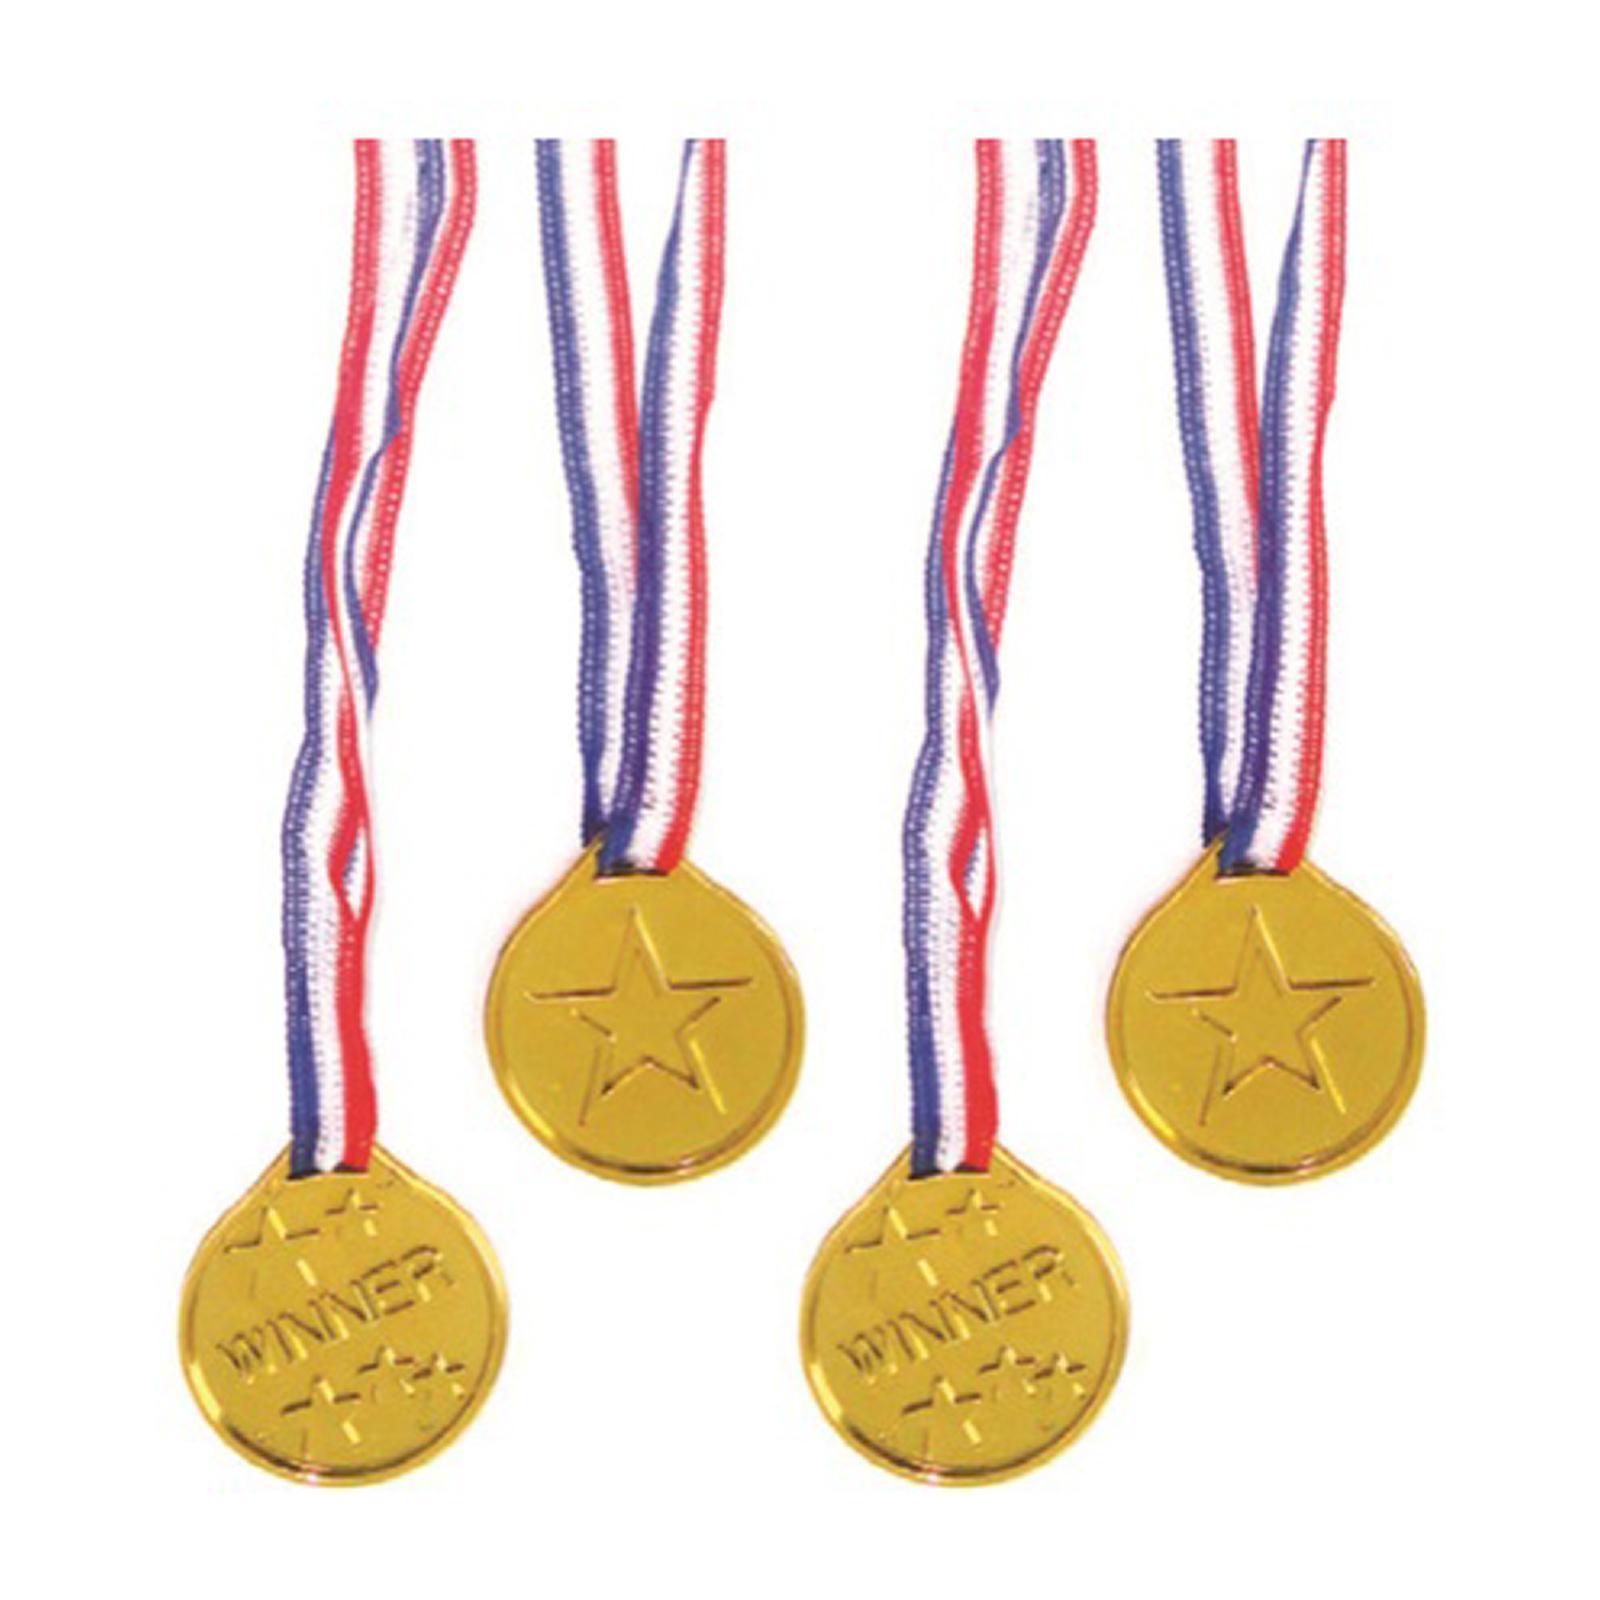 Artwrap Party Favors - Gold Medals